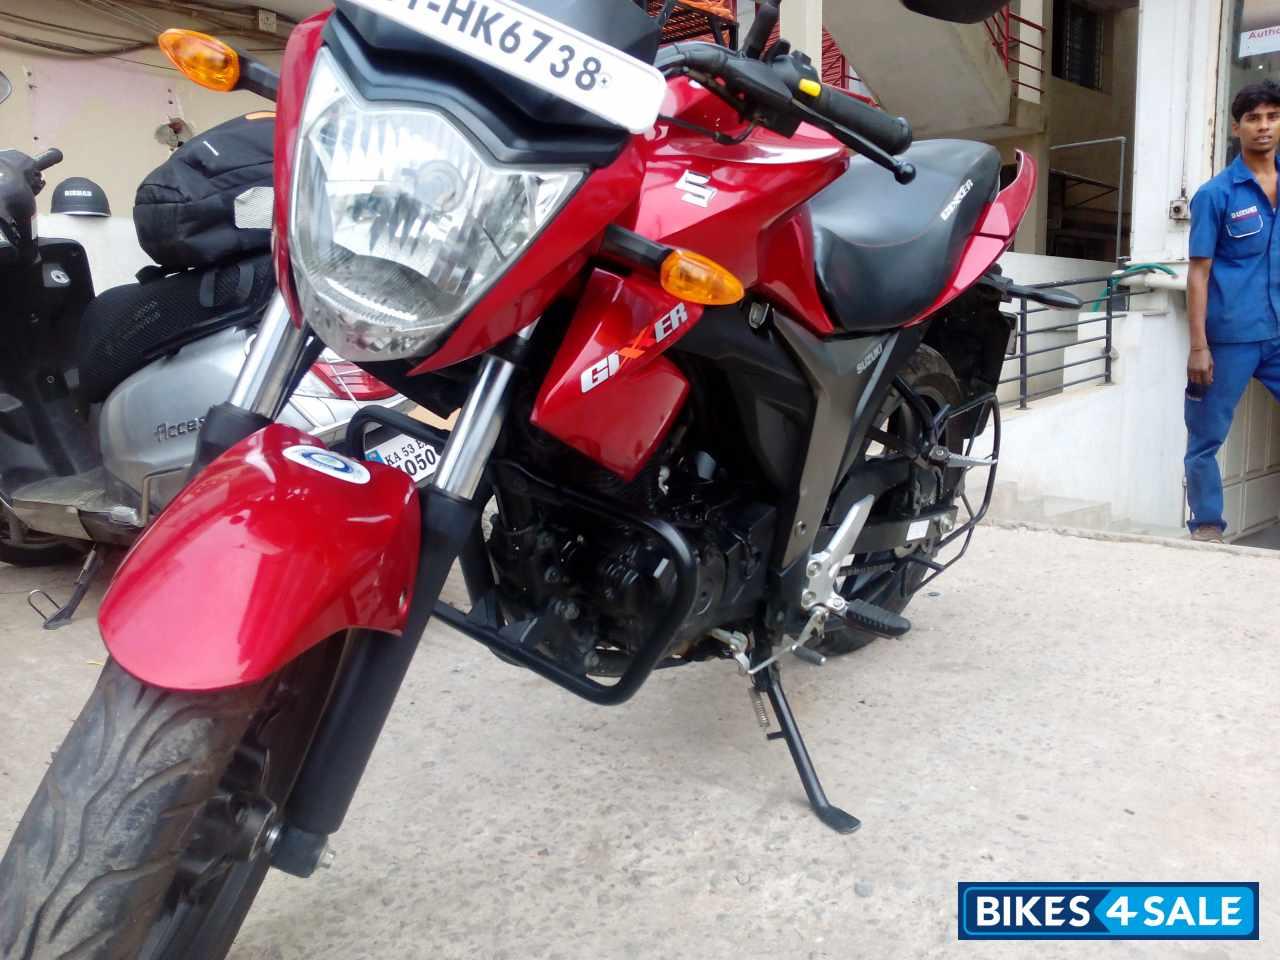 Red Suzuki Gixxer 150 for sale in Bangalore. Brand new ...